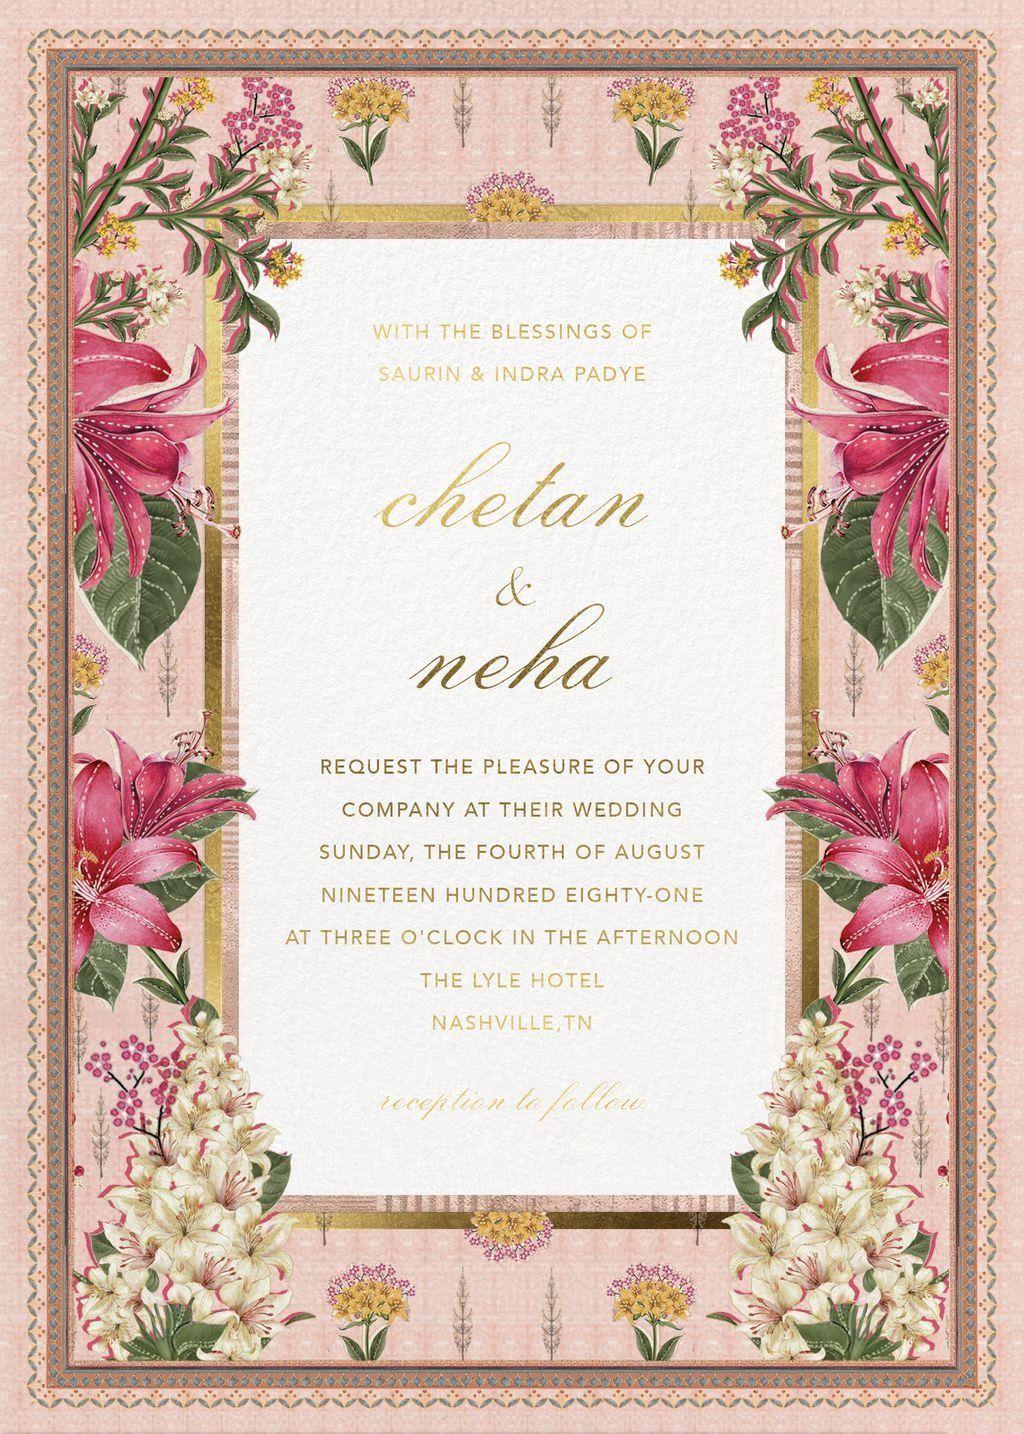 Bespoke Digital Wedding Invitations Crafted With Aesthetics Digital Wedding Invitations Indian Wedding Invitation Cards Indian Wedding Cards